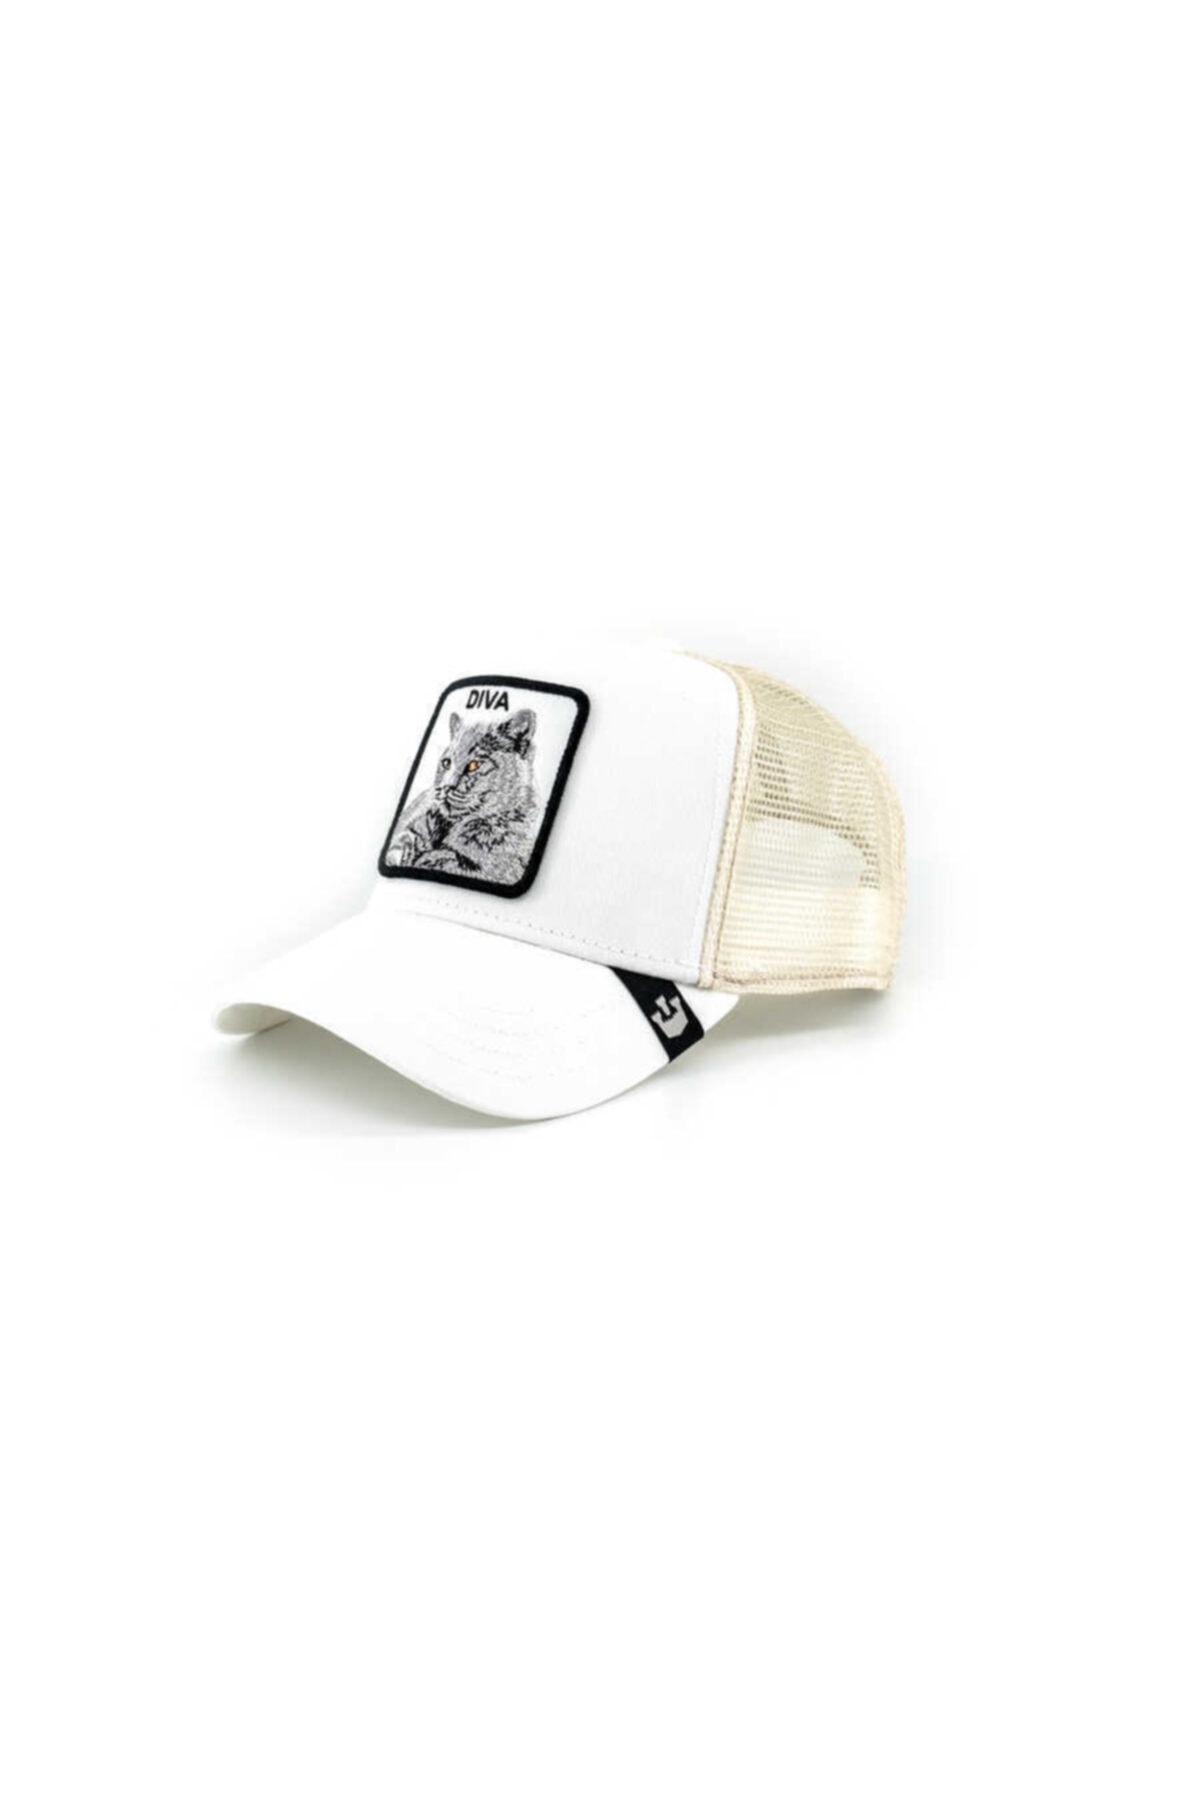 Goorin Bros Unisex Diva Stance Beyaz Standart Şapka 101-0727 2